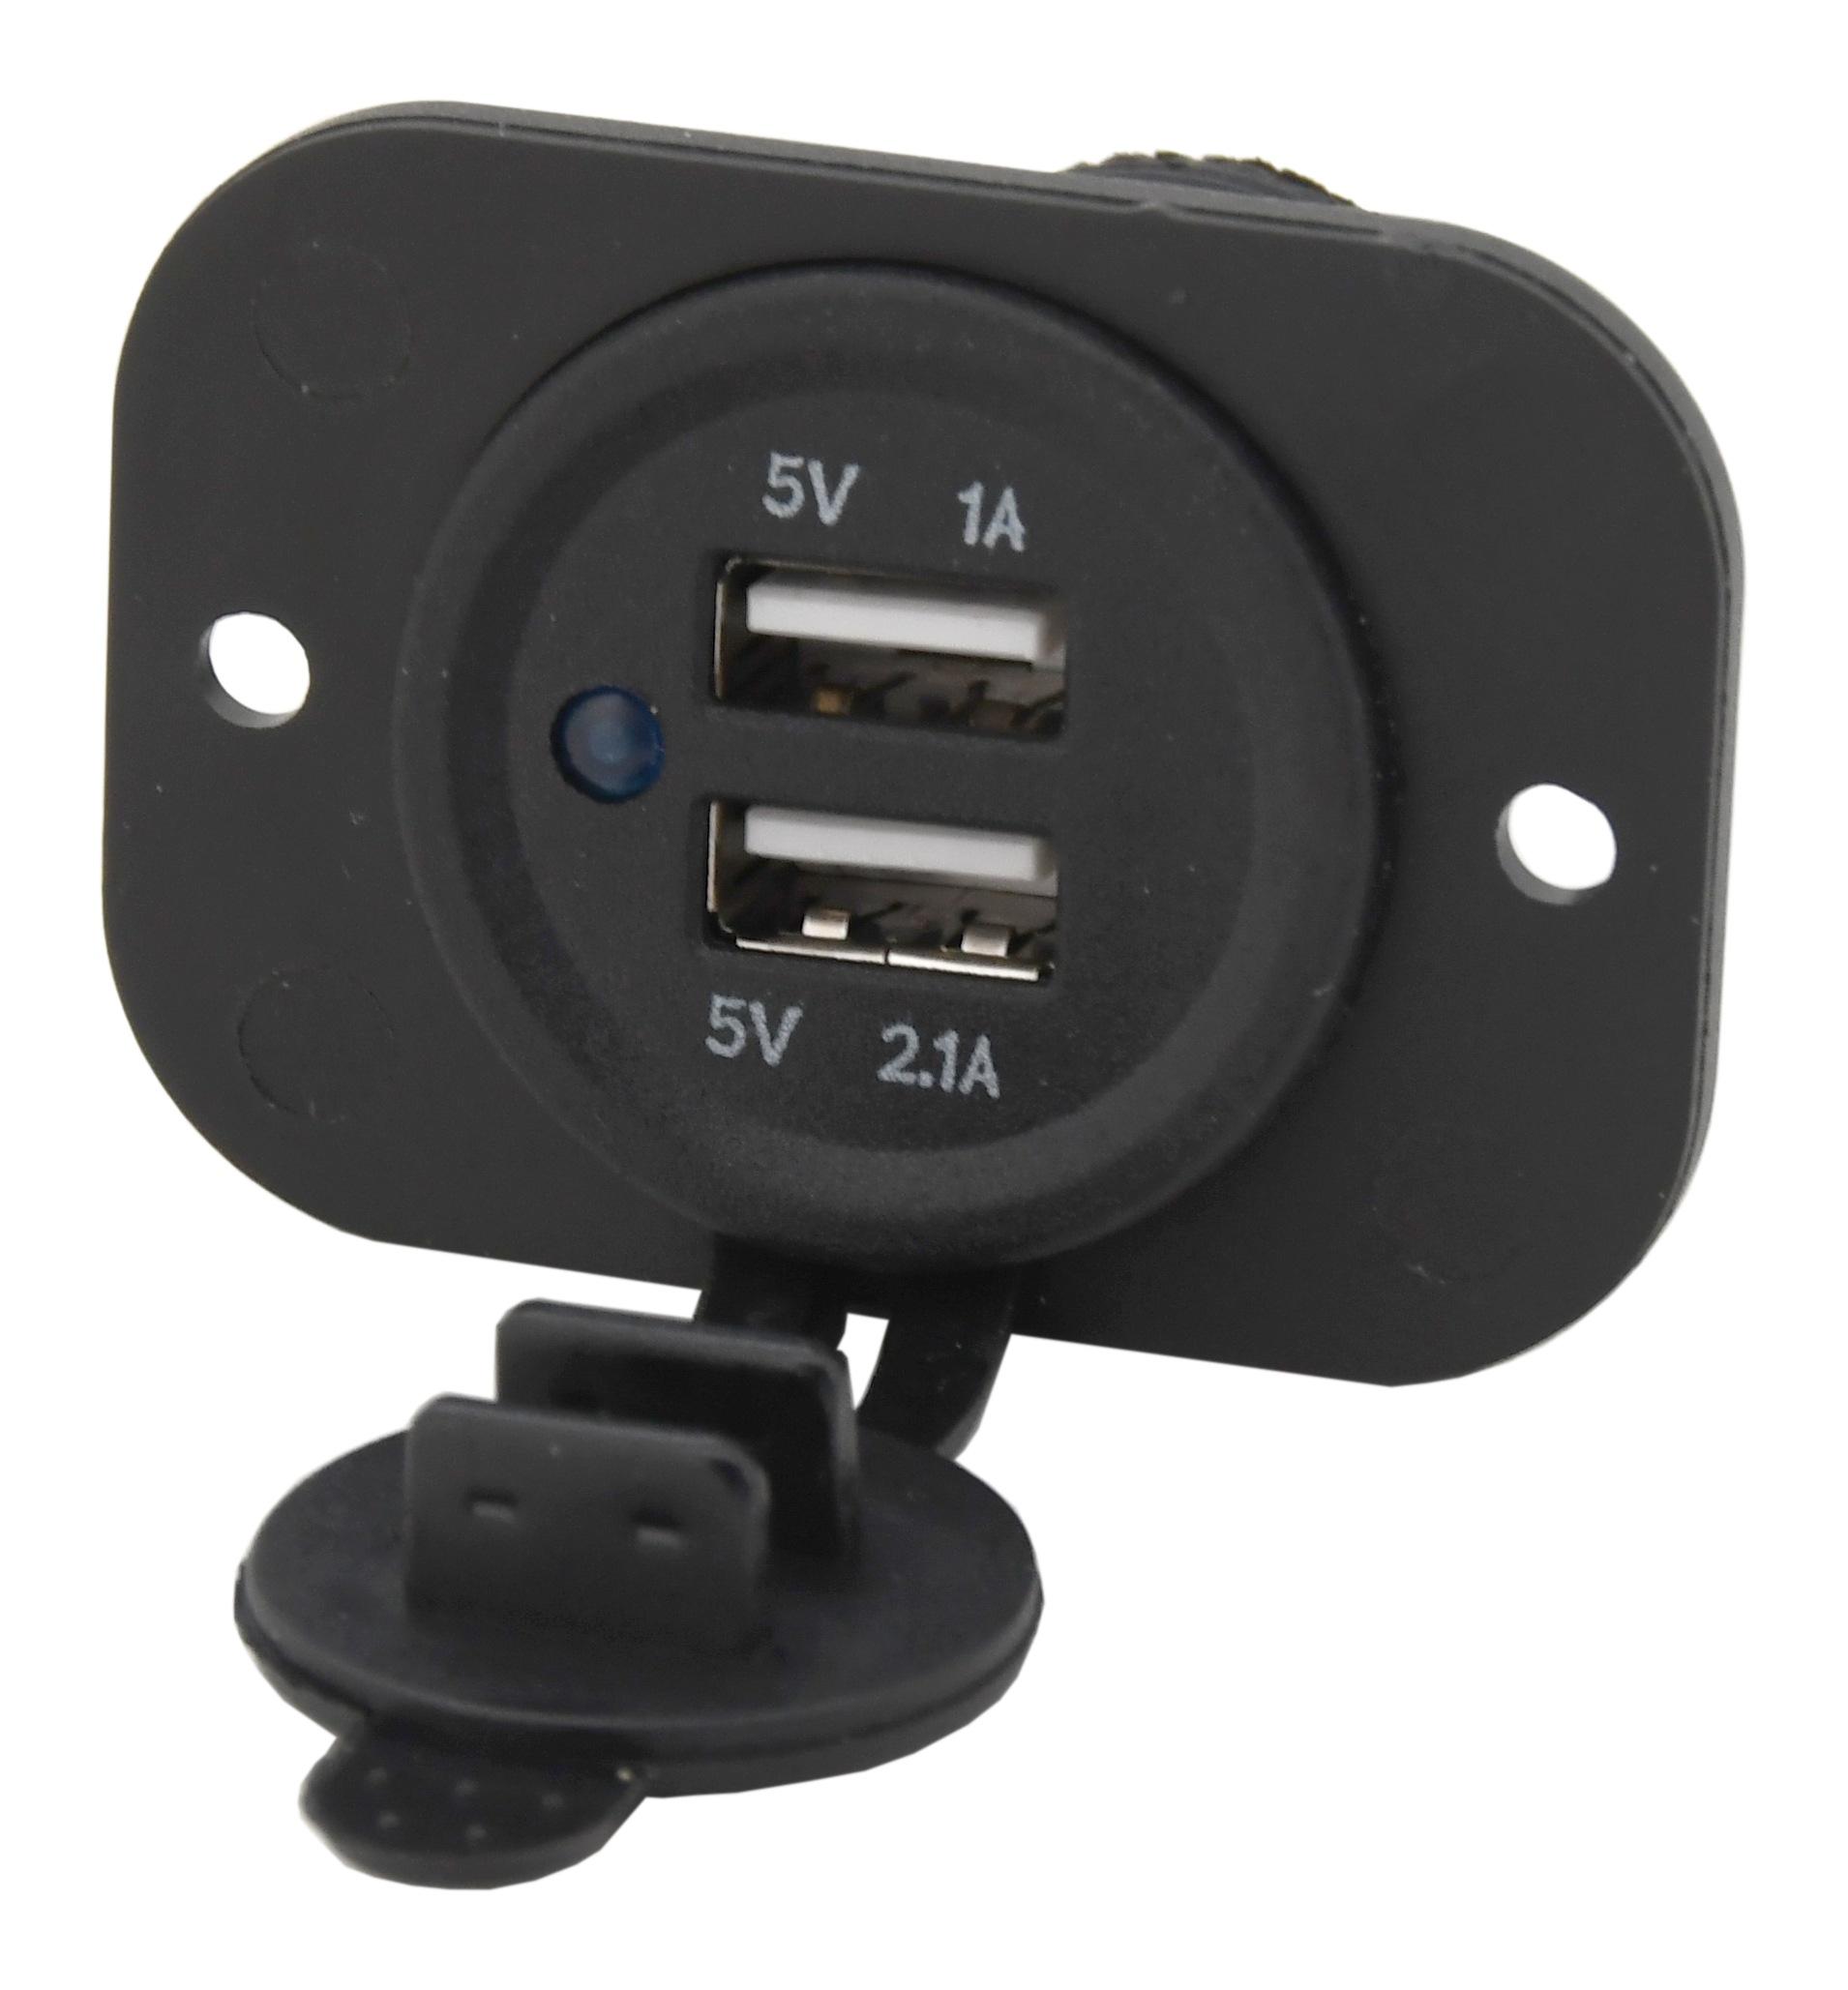 Zásuvka 2x USB 2,1A / CAR